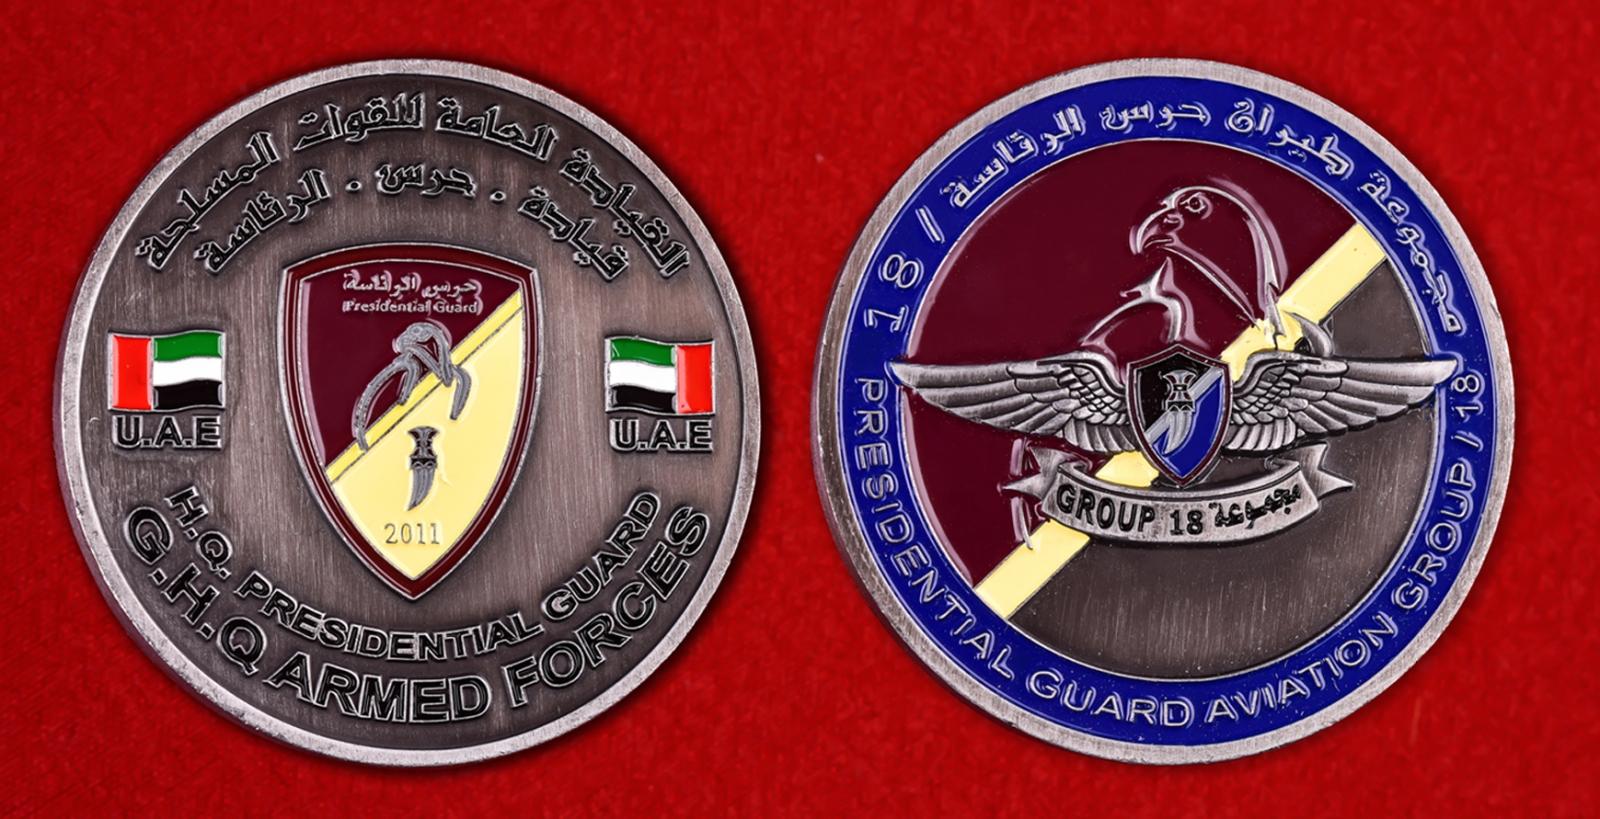 Челлендж коин 18-й авиационной группы охраны эмира ОАЭ